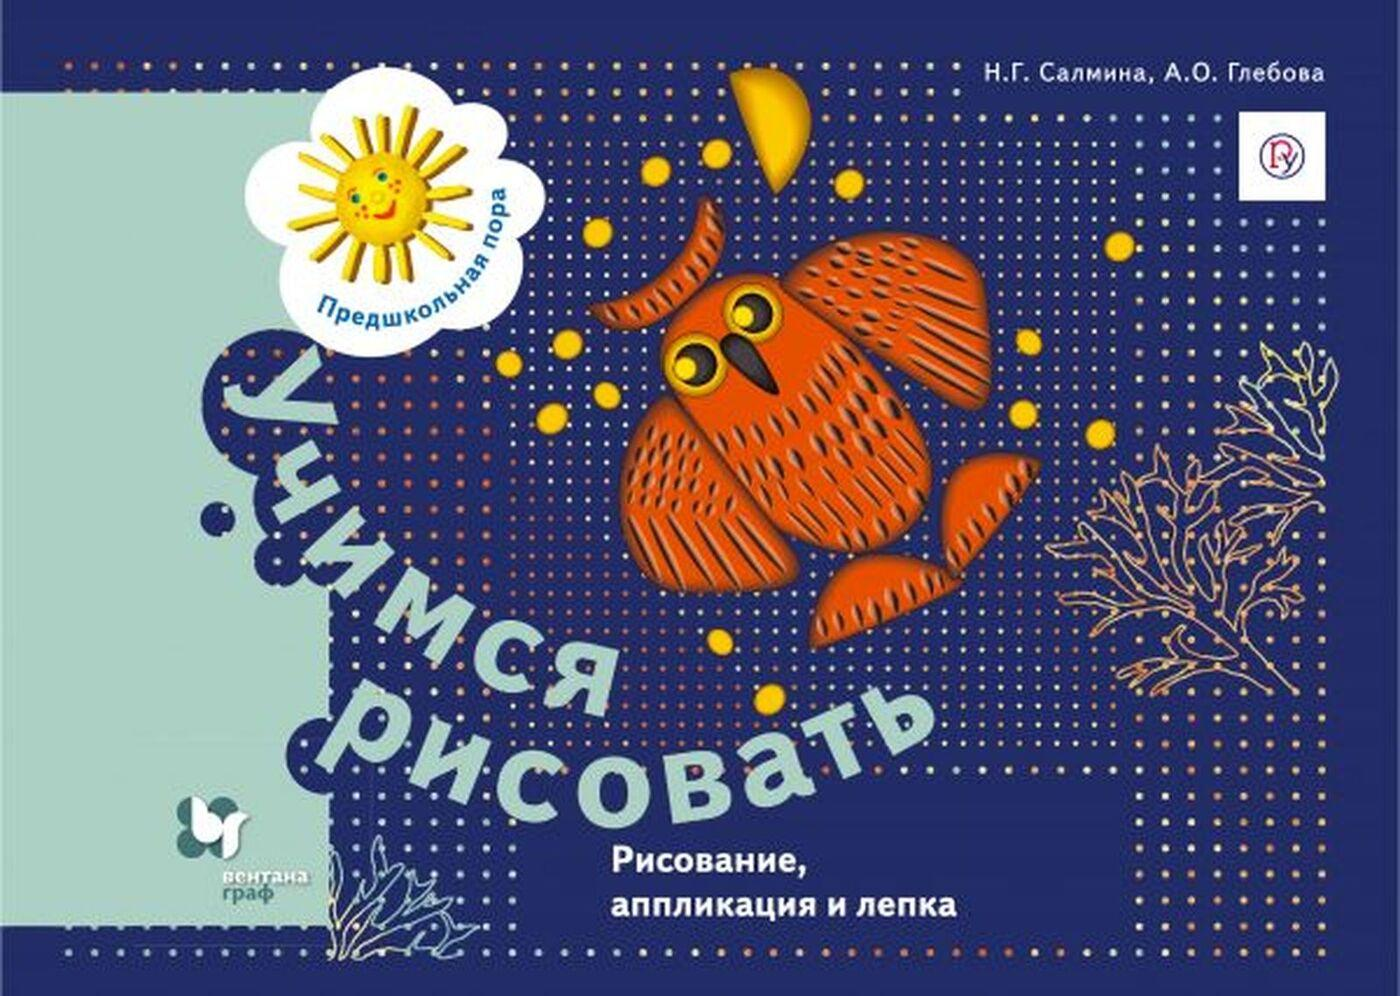 Uchimsja risovat. Risunok, applikatsija i lepka | Salmina Nina Gavrilovna, Glebova Anna Olegovna